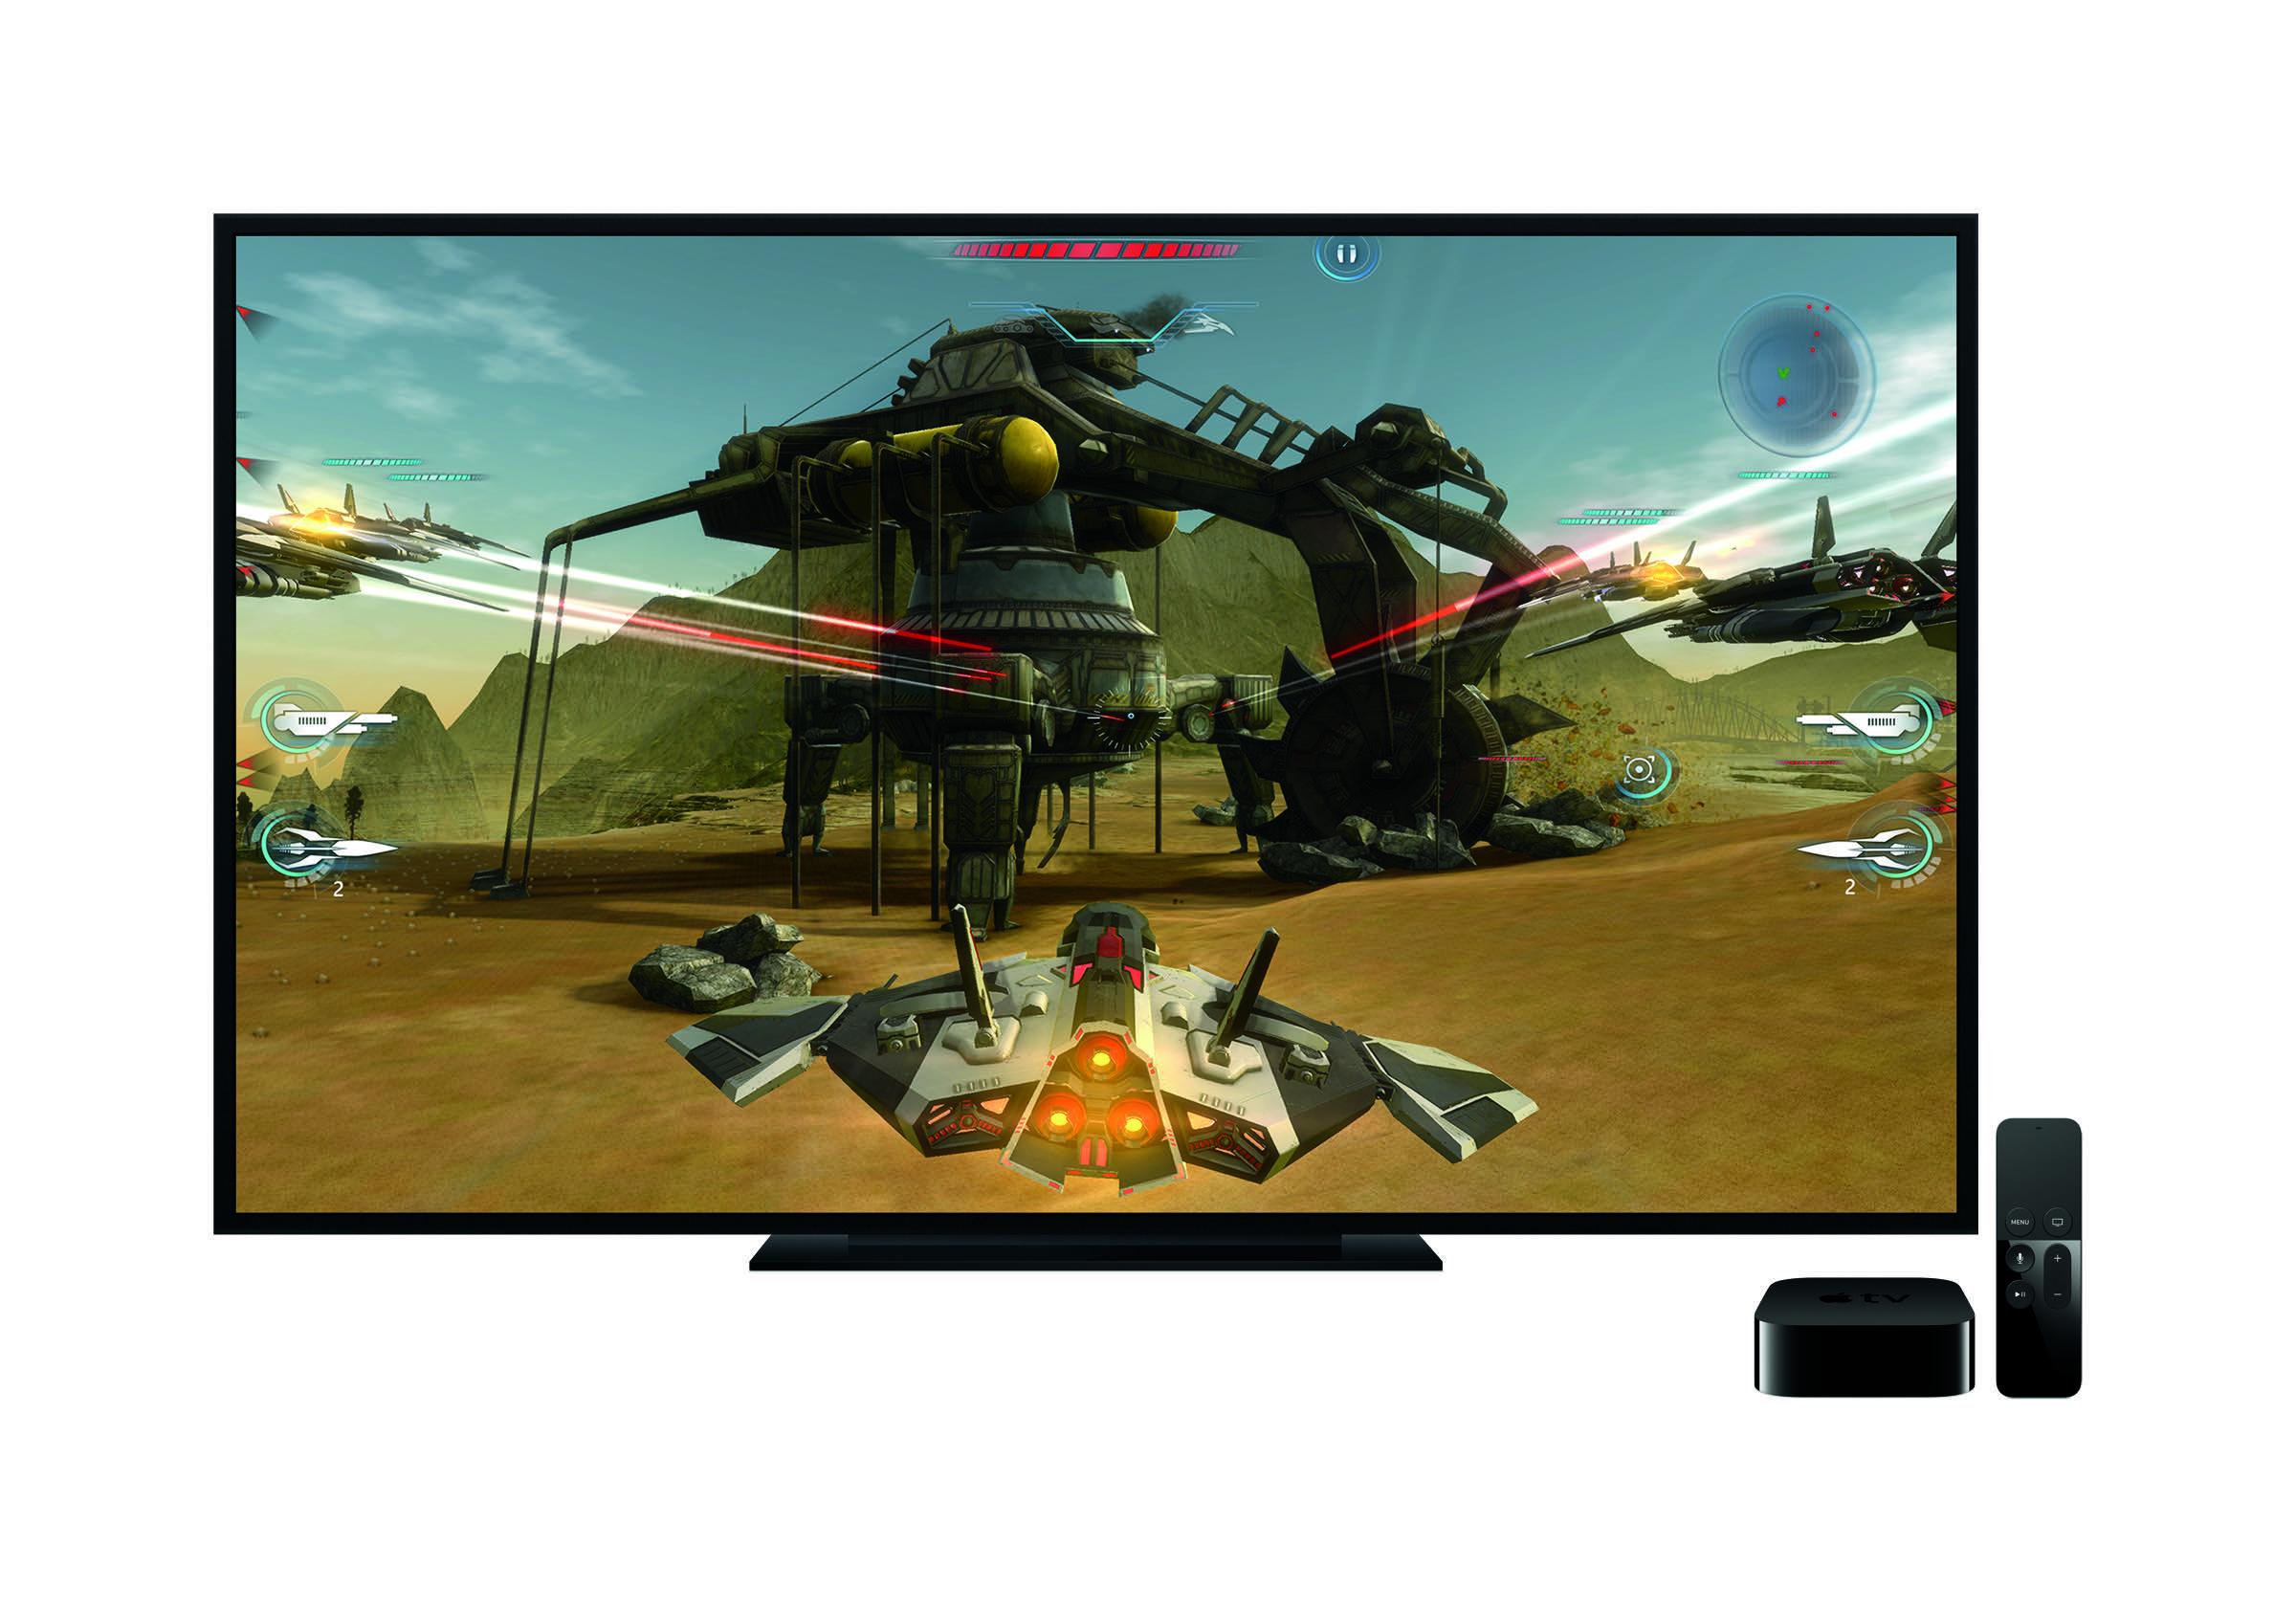 TV_AppleTV_Remote_MetalMorph-PRINT